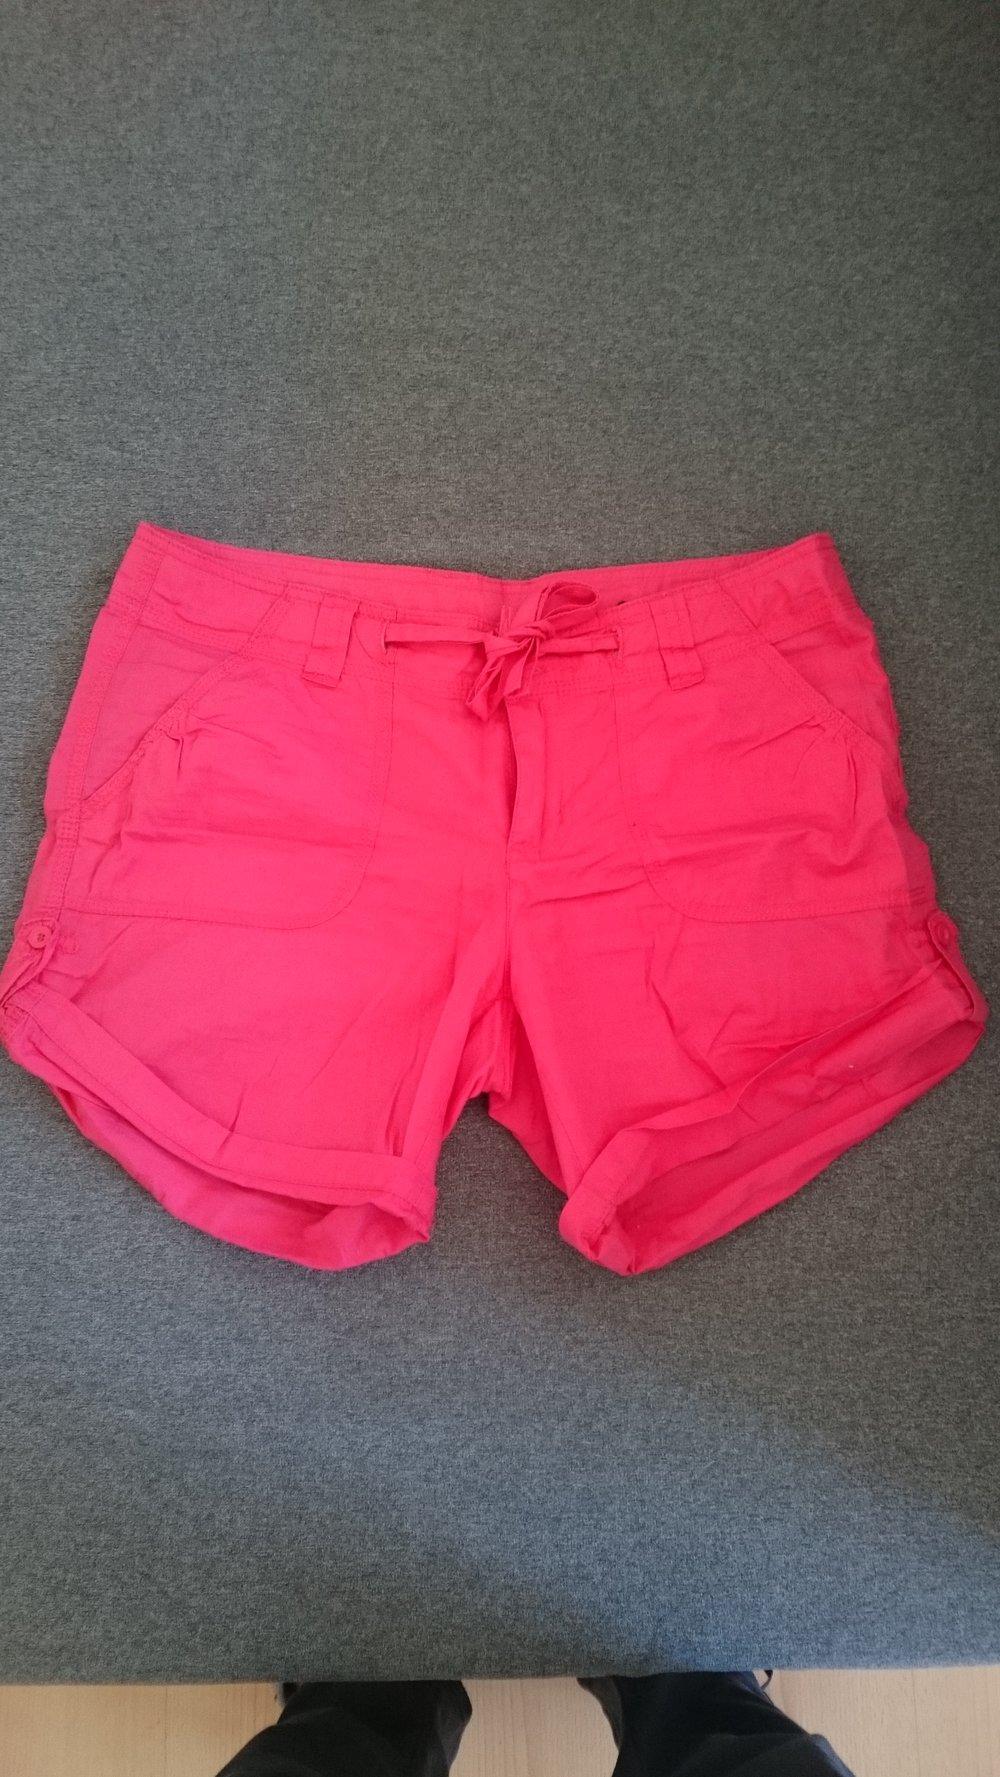 colours of the world kurze hose shorts rot pink. Black Bedroom Furniture Sets. Home Design Ideas